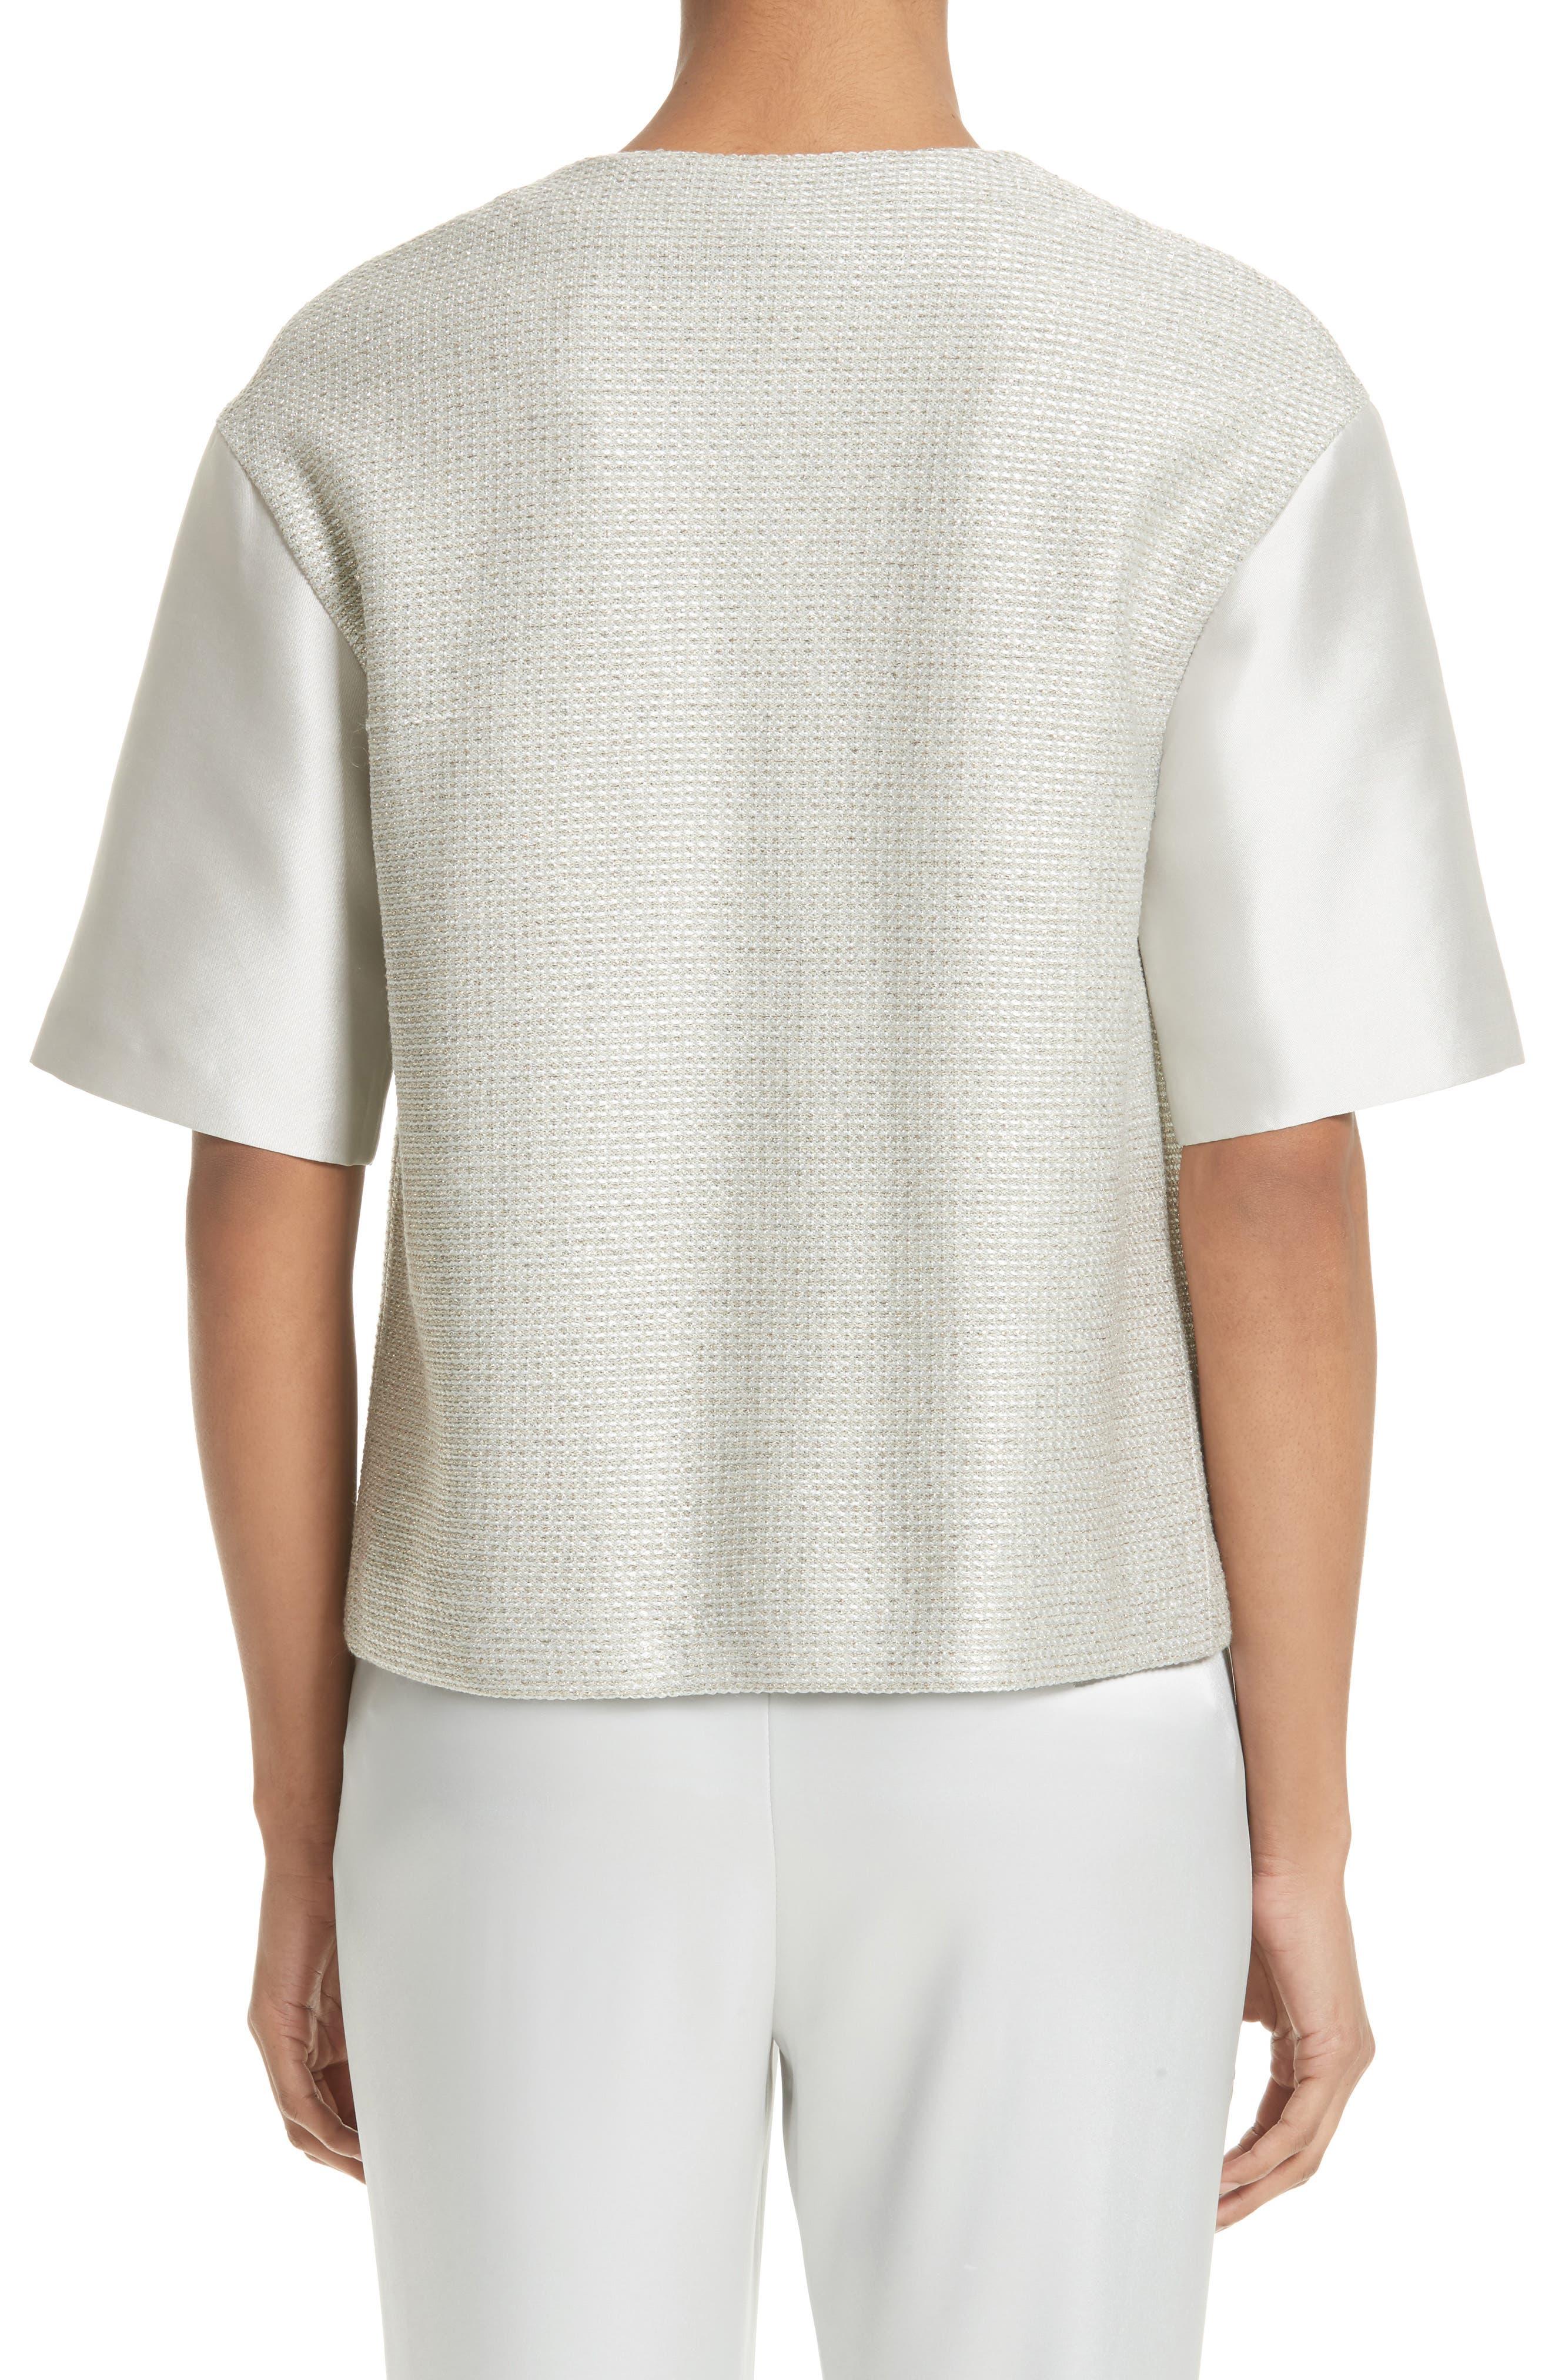 Alternate Image 2  - St. John Collection Beaded Jasmine Sparkle Knit Jacket